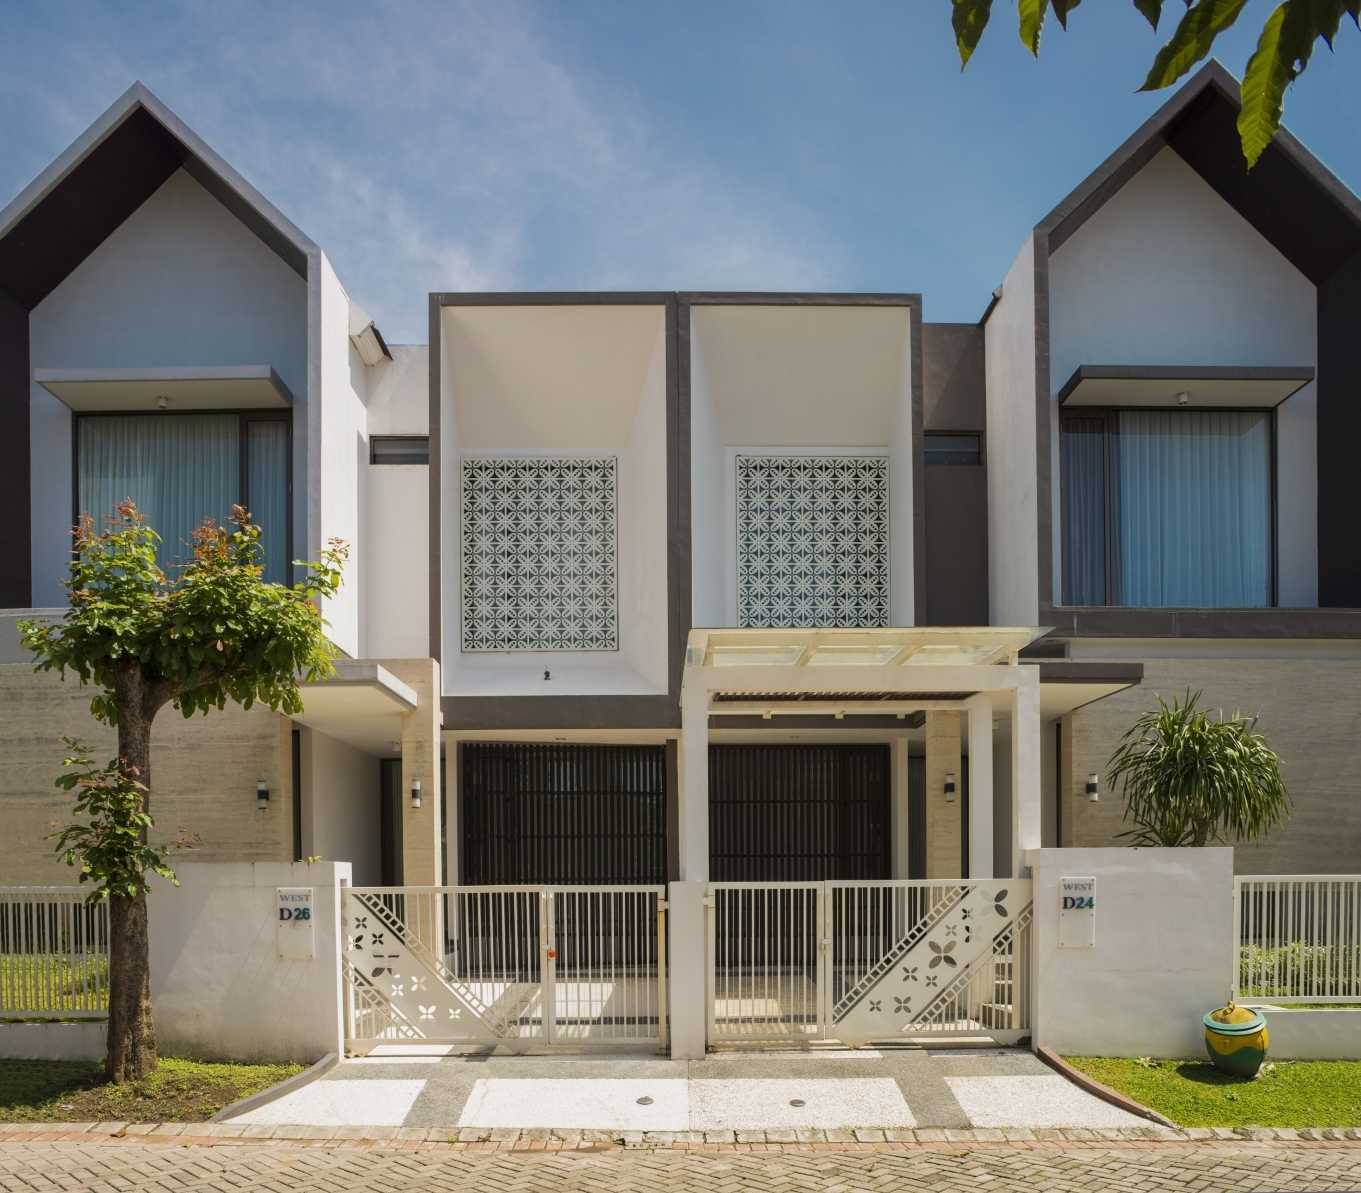 Satuvista Architect The Amogha - 140  Malang, Kota Malang, Jawa Timur, Indonesia Malang, Kota Malang, Jawa Timur, Indonesia Front View Minimalis  49960